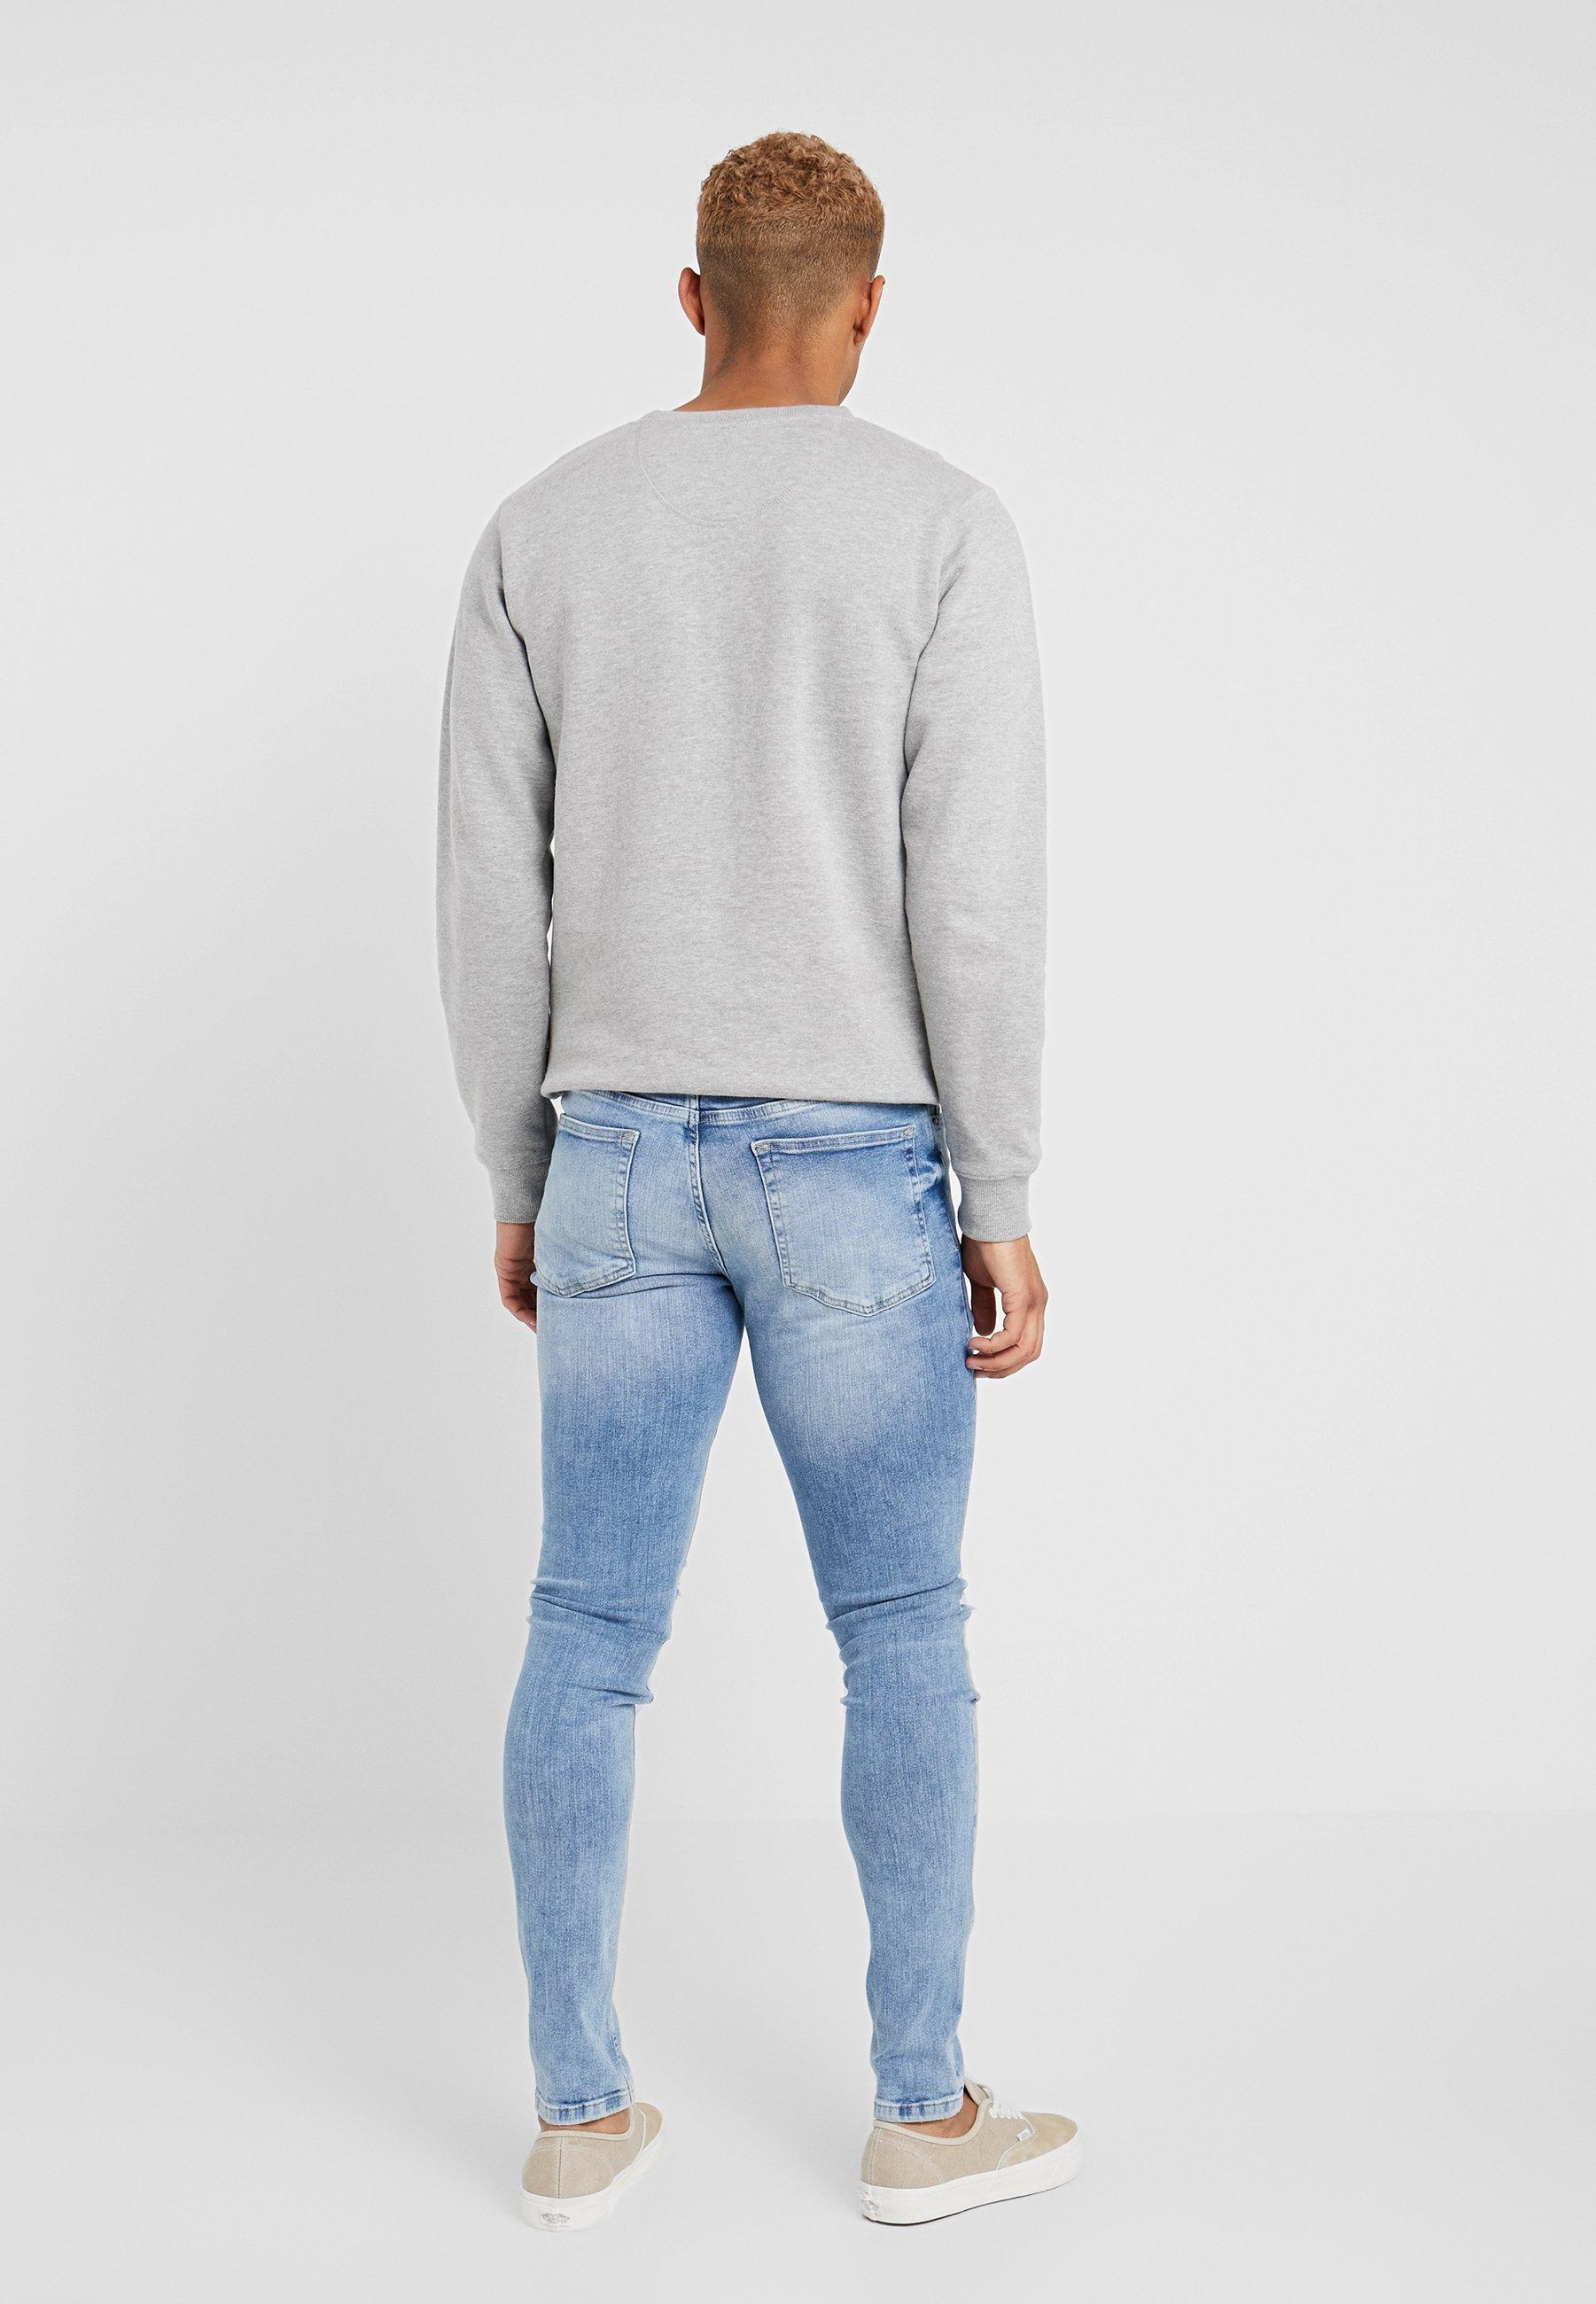 Denim Yourturn Jeans Yourturn Yourturn Denim Yourturn SkinnyBlue Denim SkinnyBlue Jeans Jeans SkinnyBlue Jeans wPknON80X